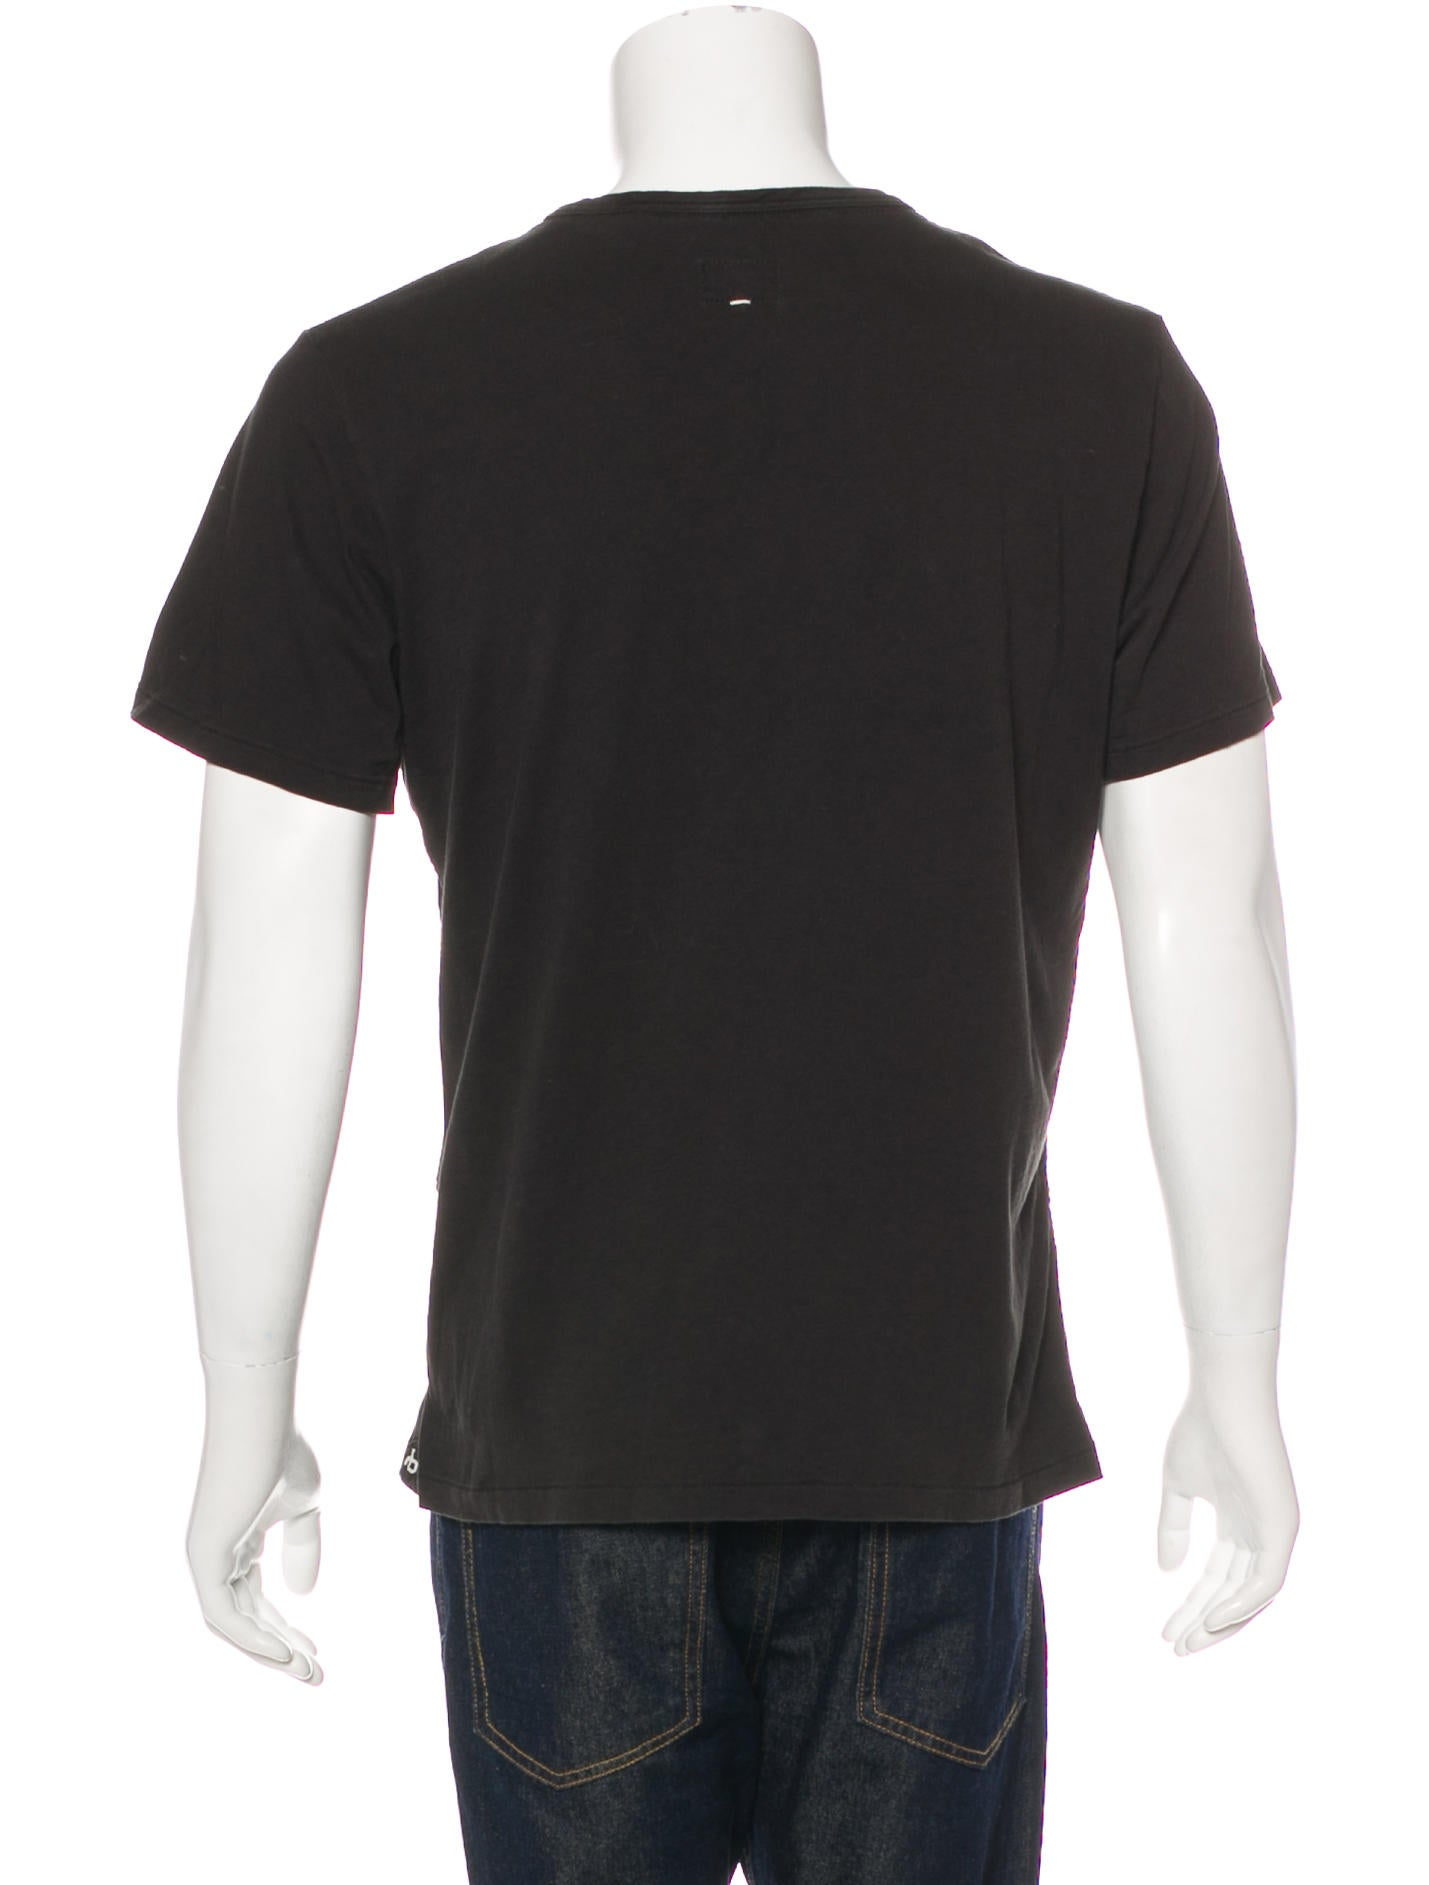 Rag Bone Crew Neck T Shirt Clothing Wragb90232 The